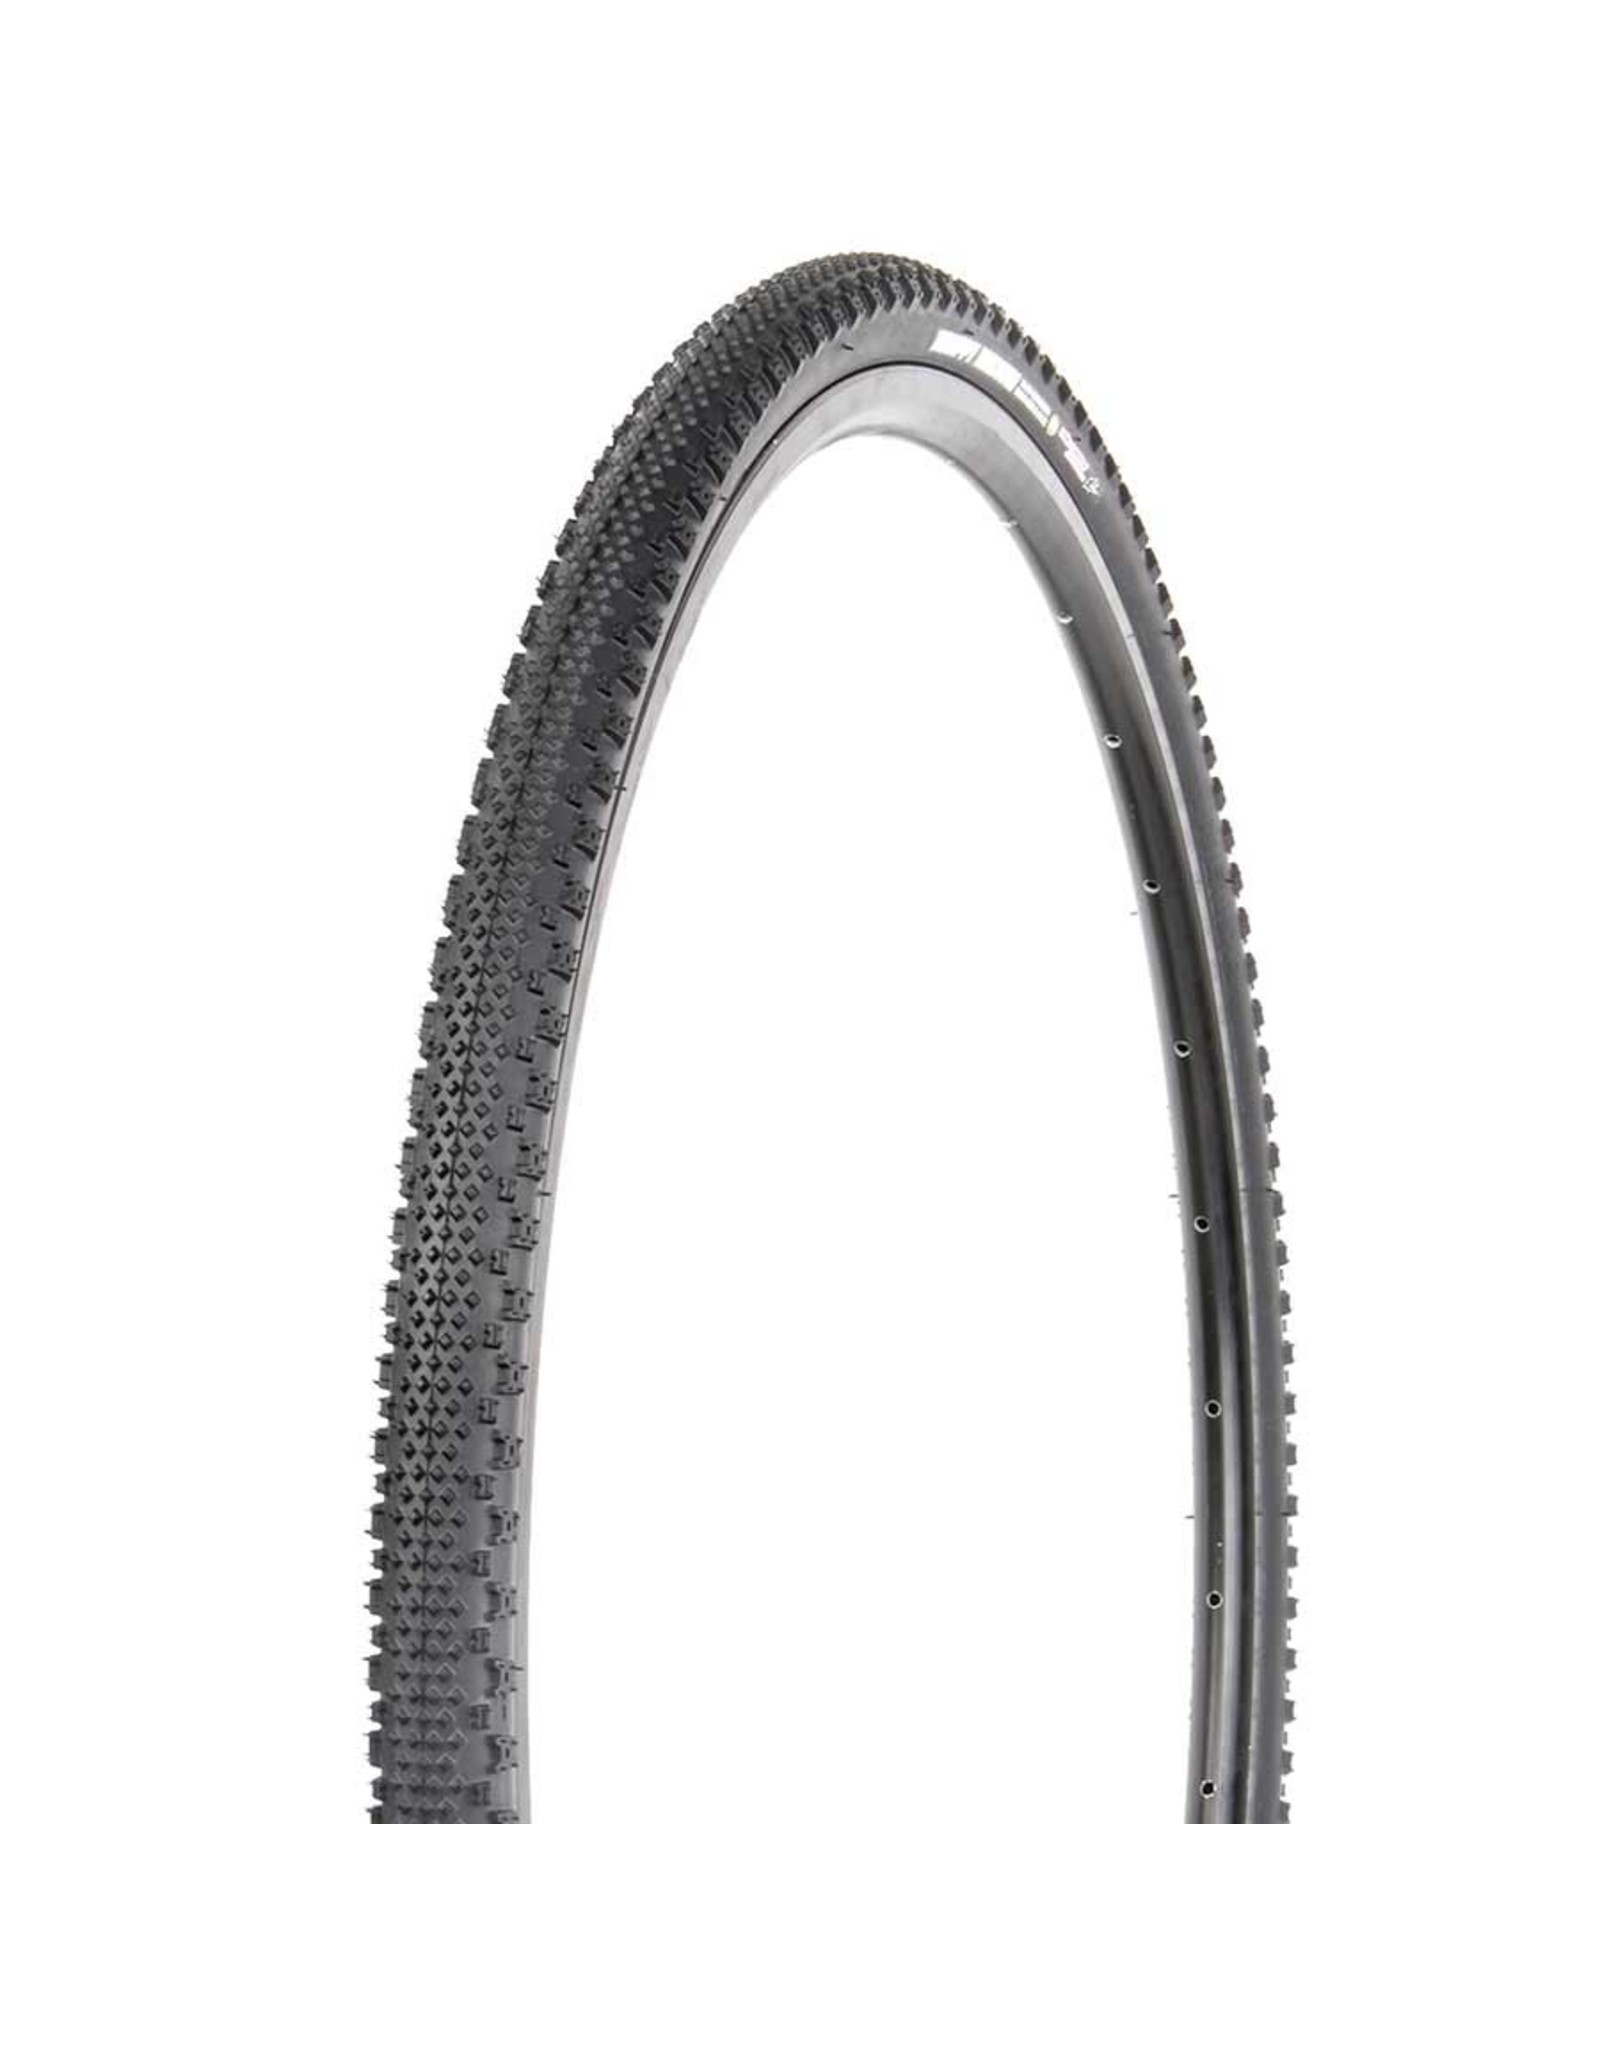 Kenda, Happy Medium, Tire, 700x32C, Folding, Clincher, Dual, 120TPI, Black